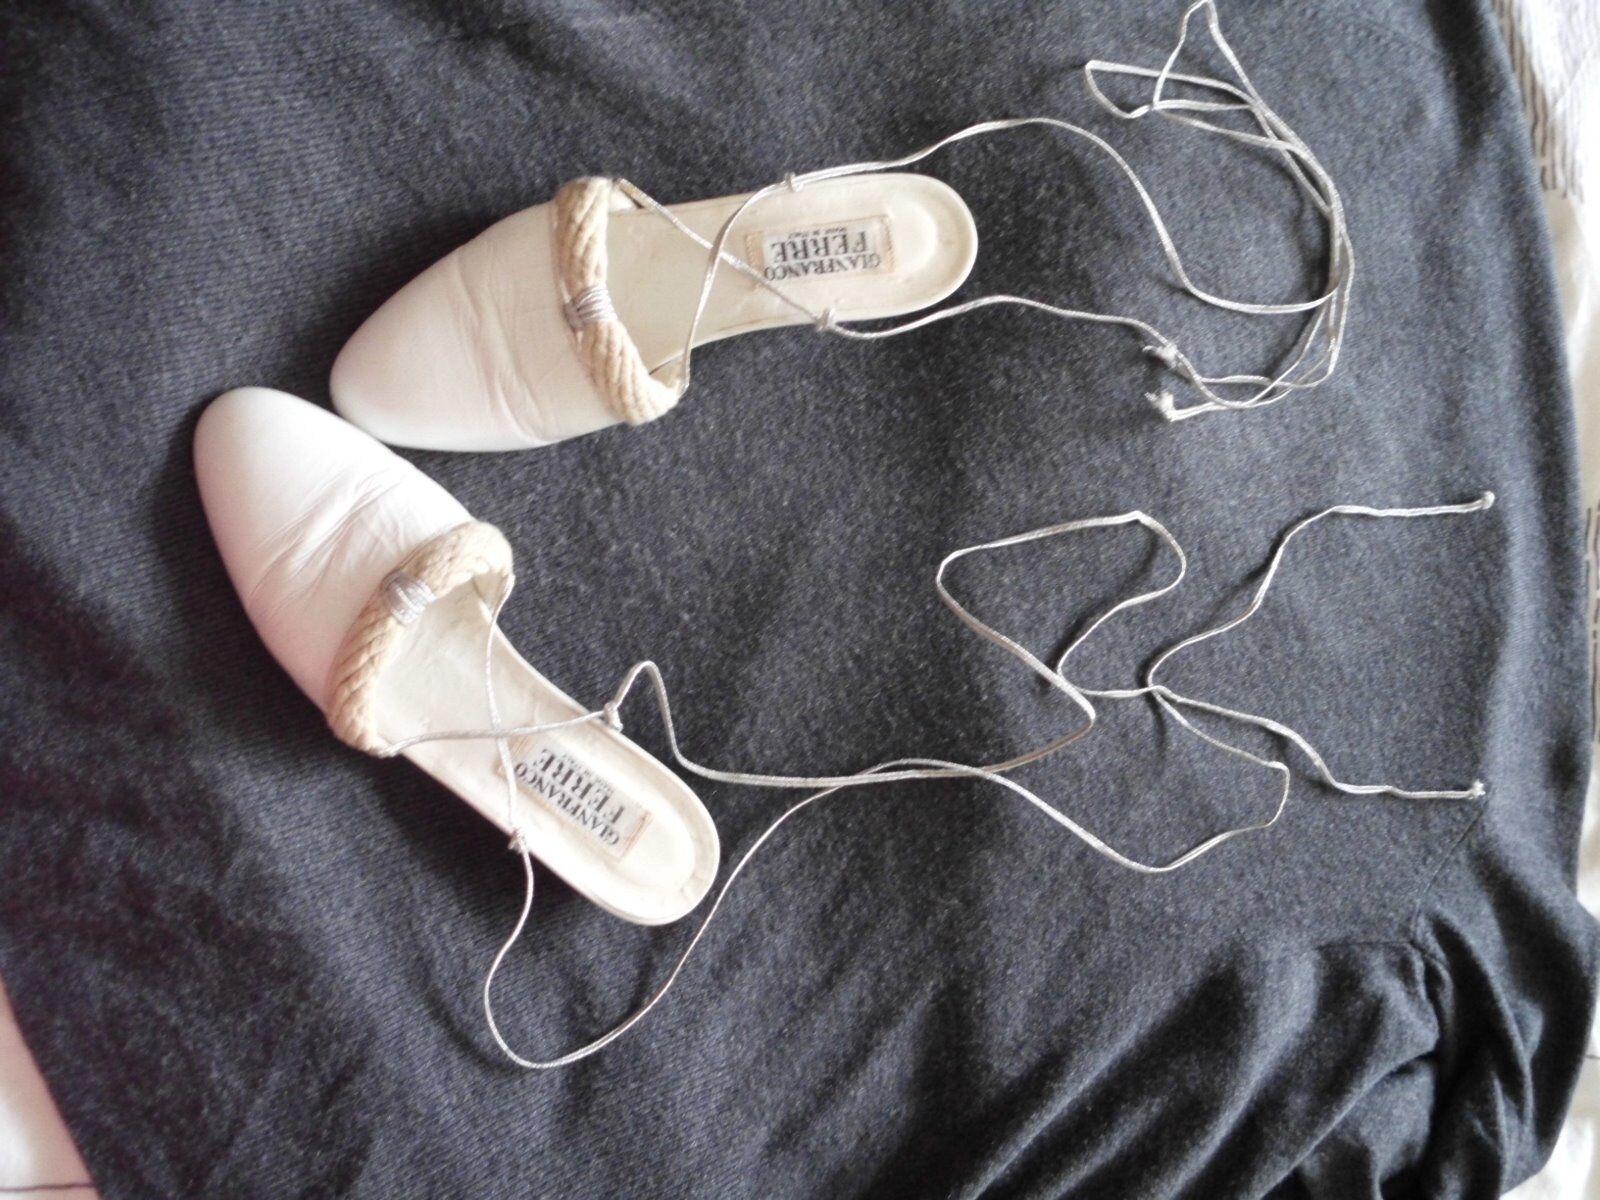 Billig hohe Qualität Gianfranco Ferre Schuhe